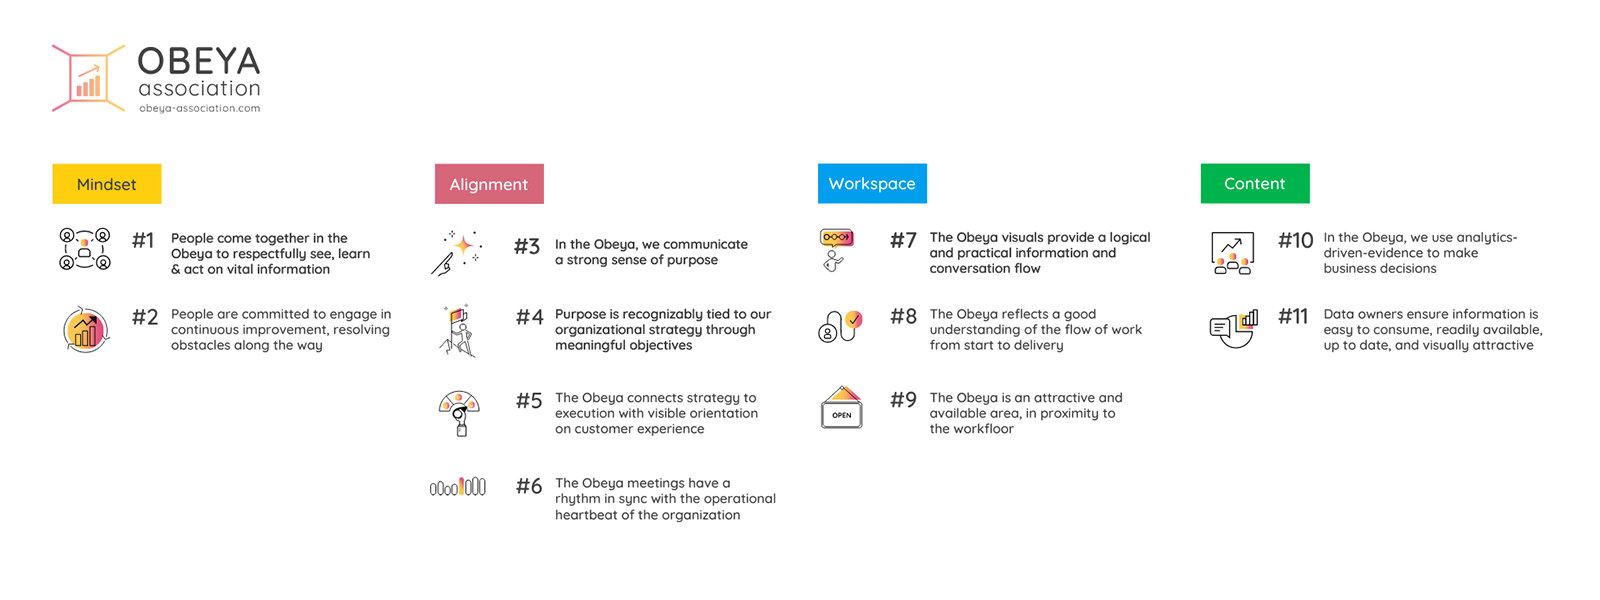 Obeya Association - The 11 Principles - Overview - Website